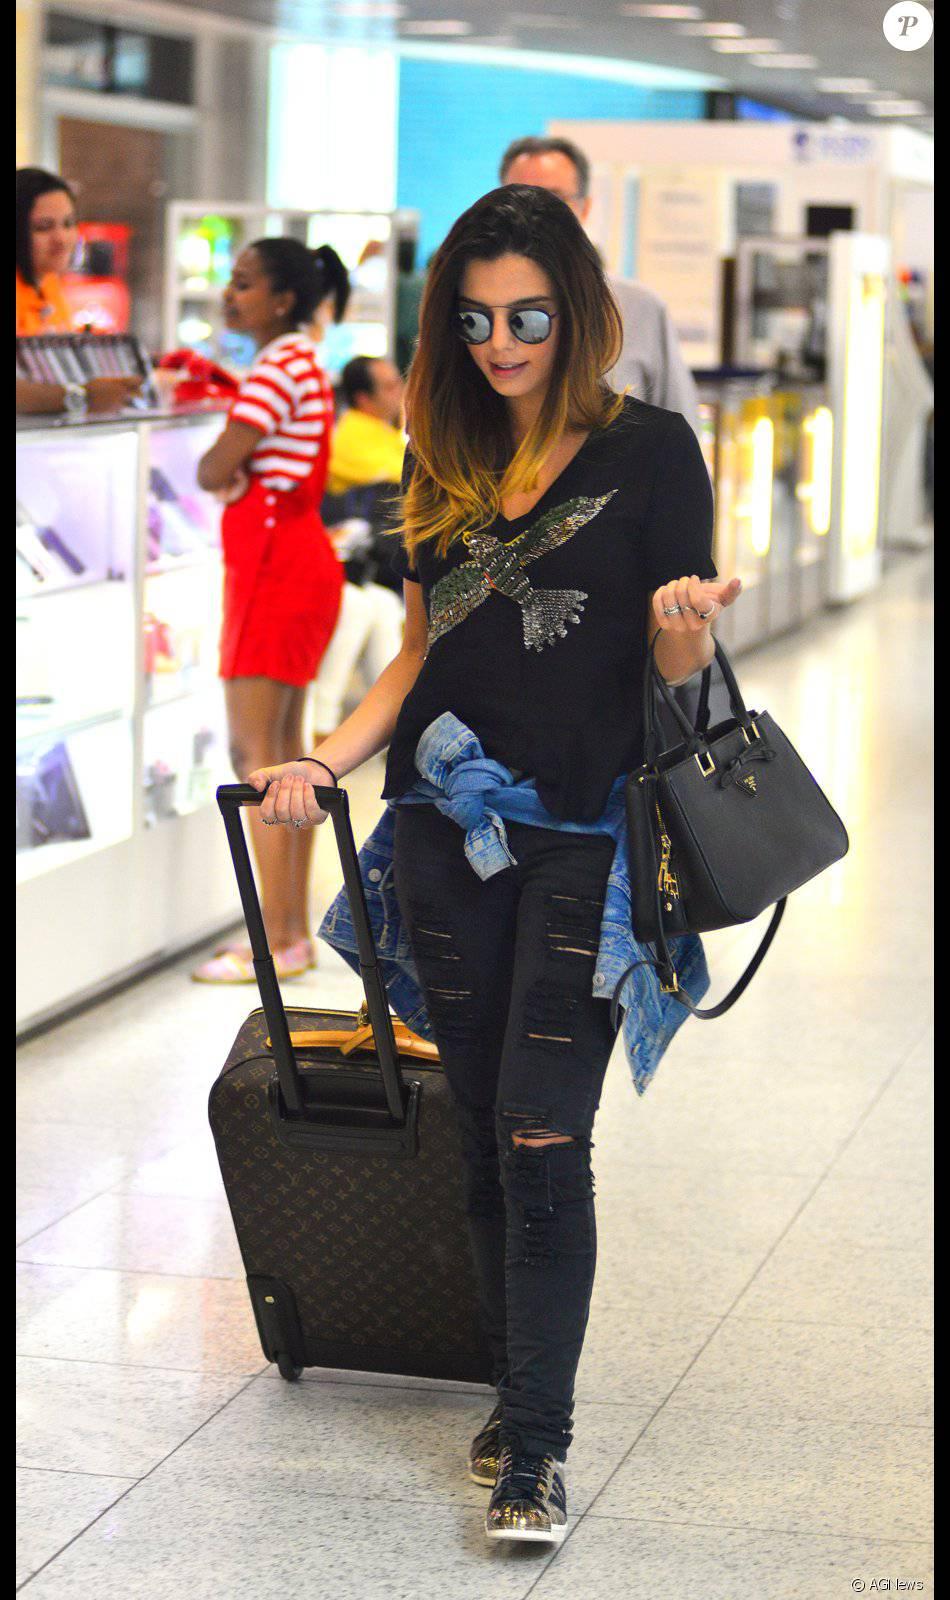 Giovanna Lancellotti embarca no Rio com mala de R$ 14 mil e bolsa de R$ 2,6 mil